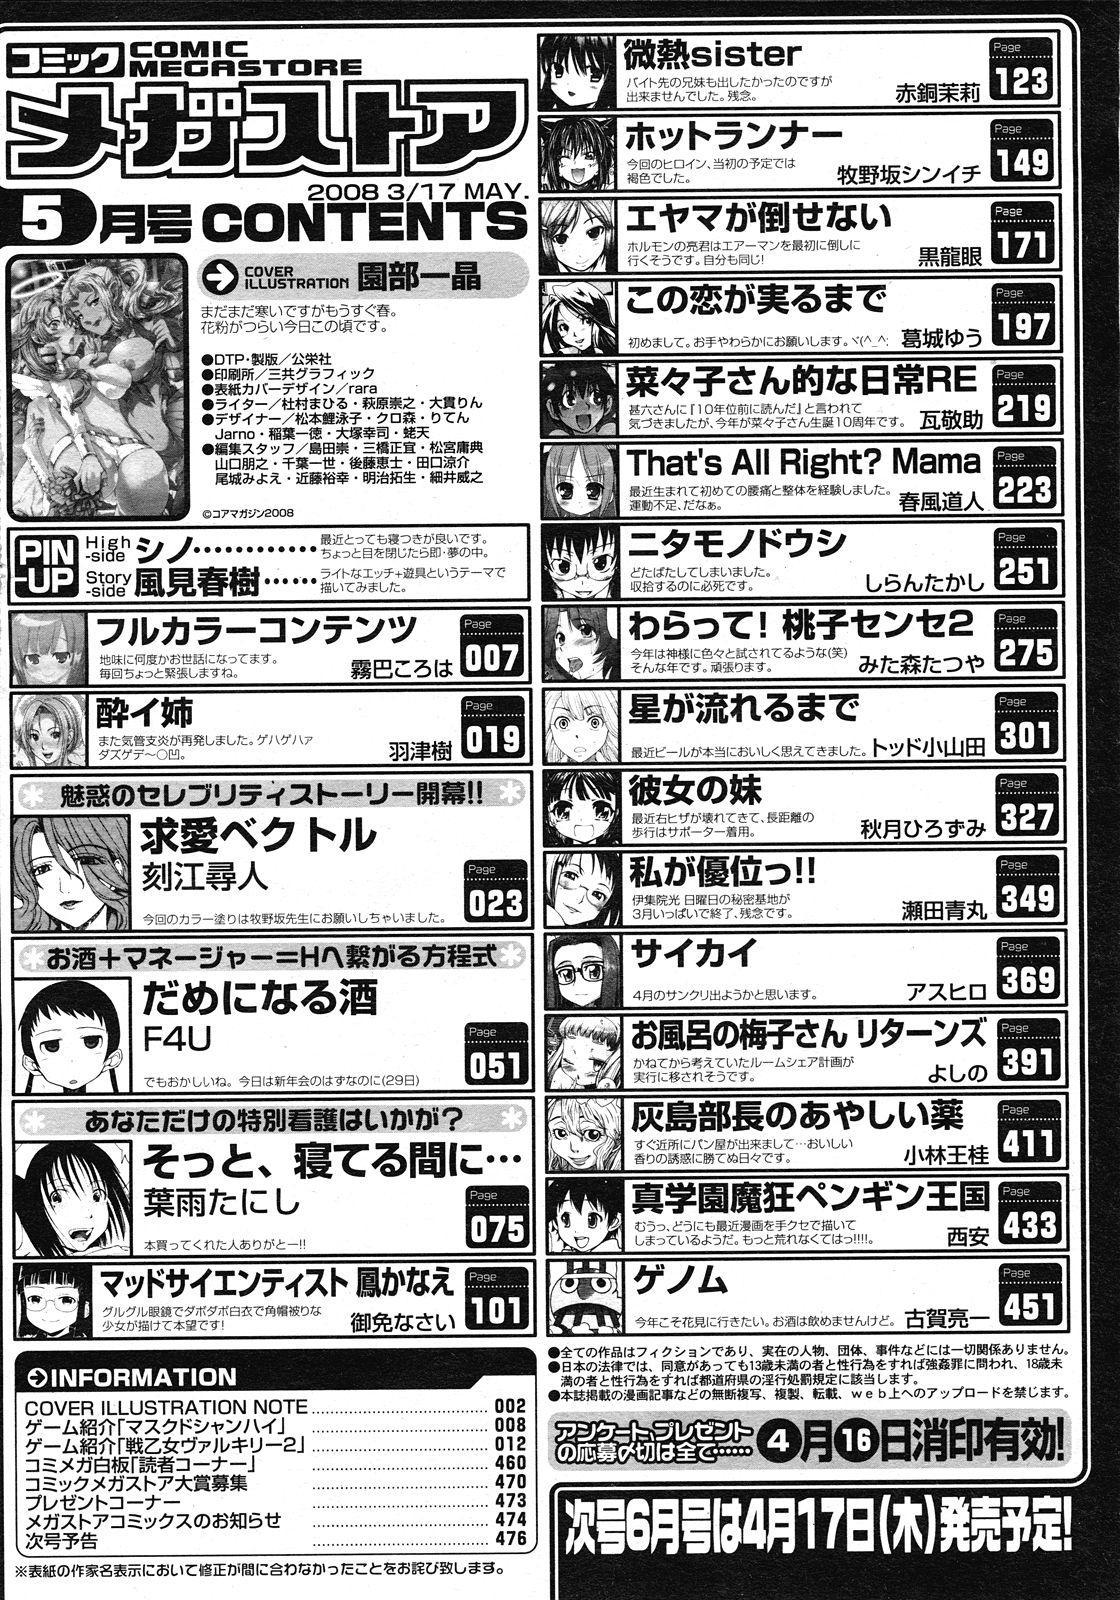 COMIC Megastore 2008-05 475